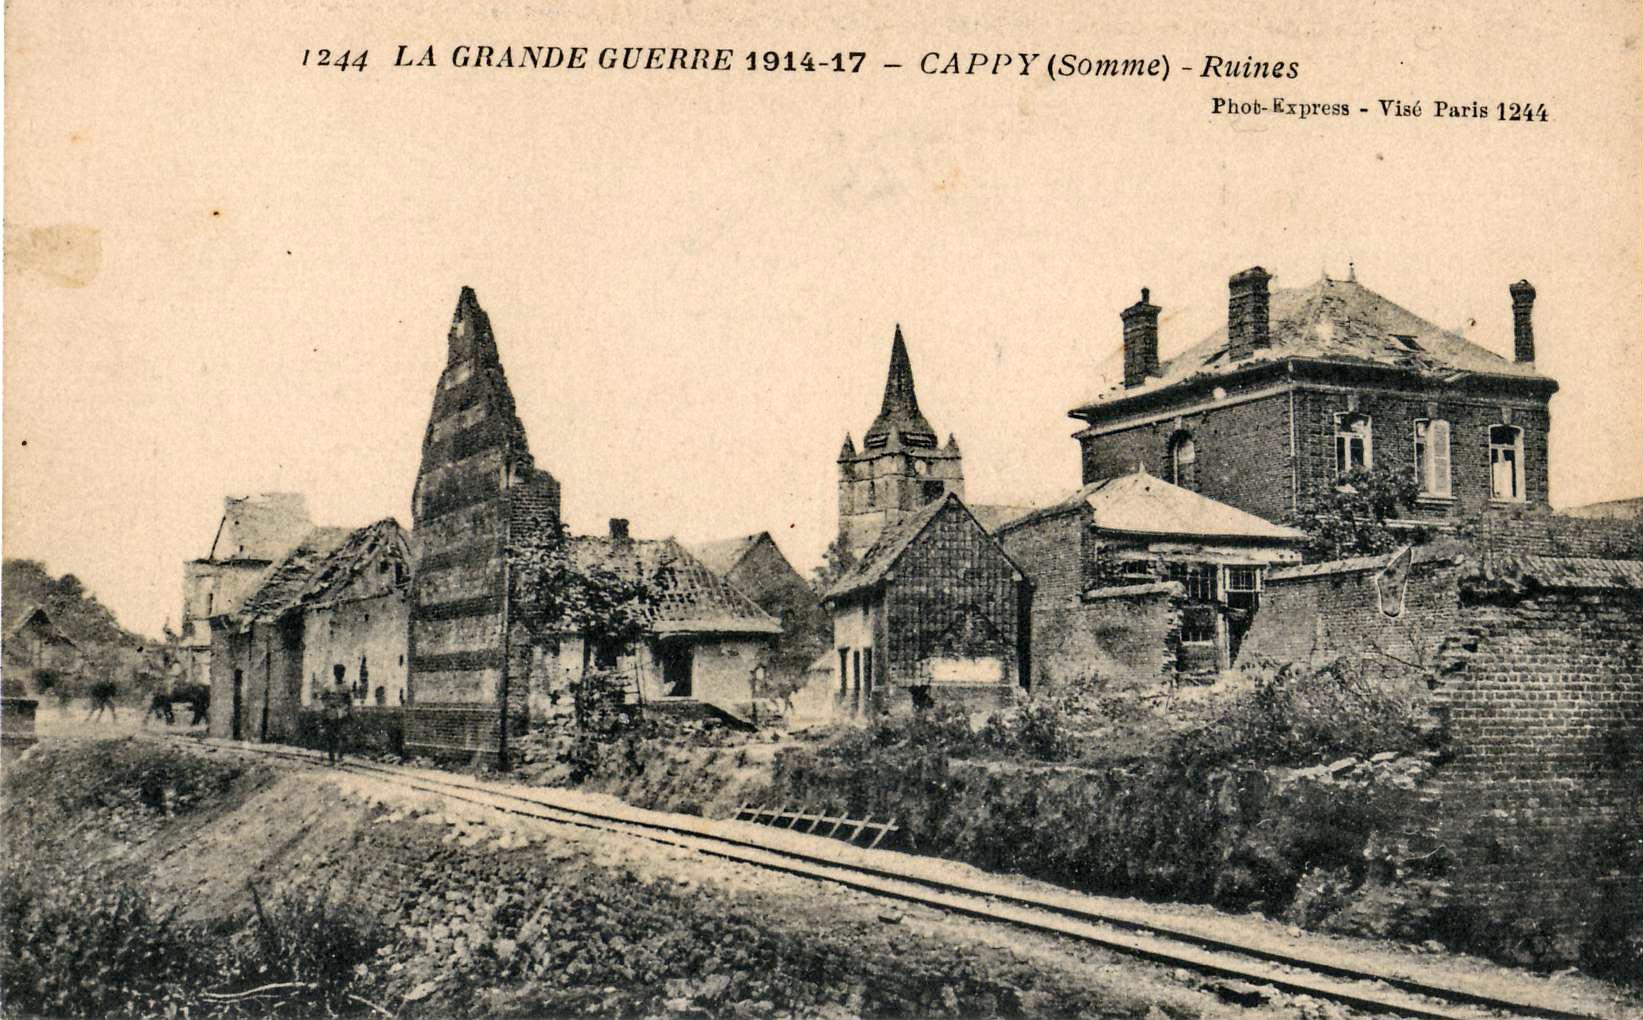 File:Phot-Express 1244 - LA GRANDE GUERRE 1914-1917 - CAPPY -